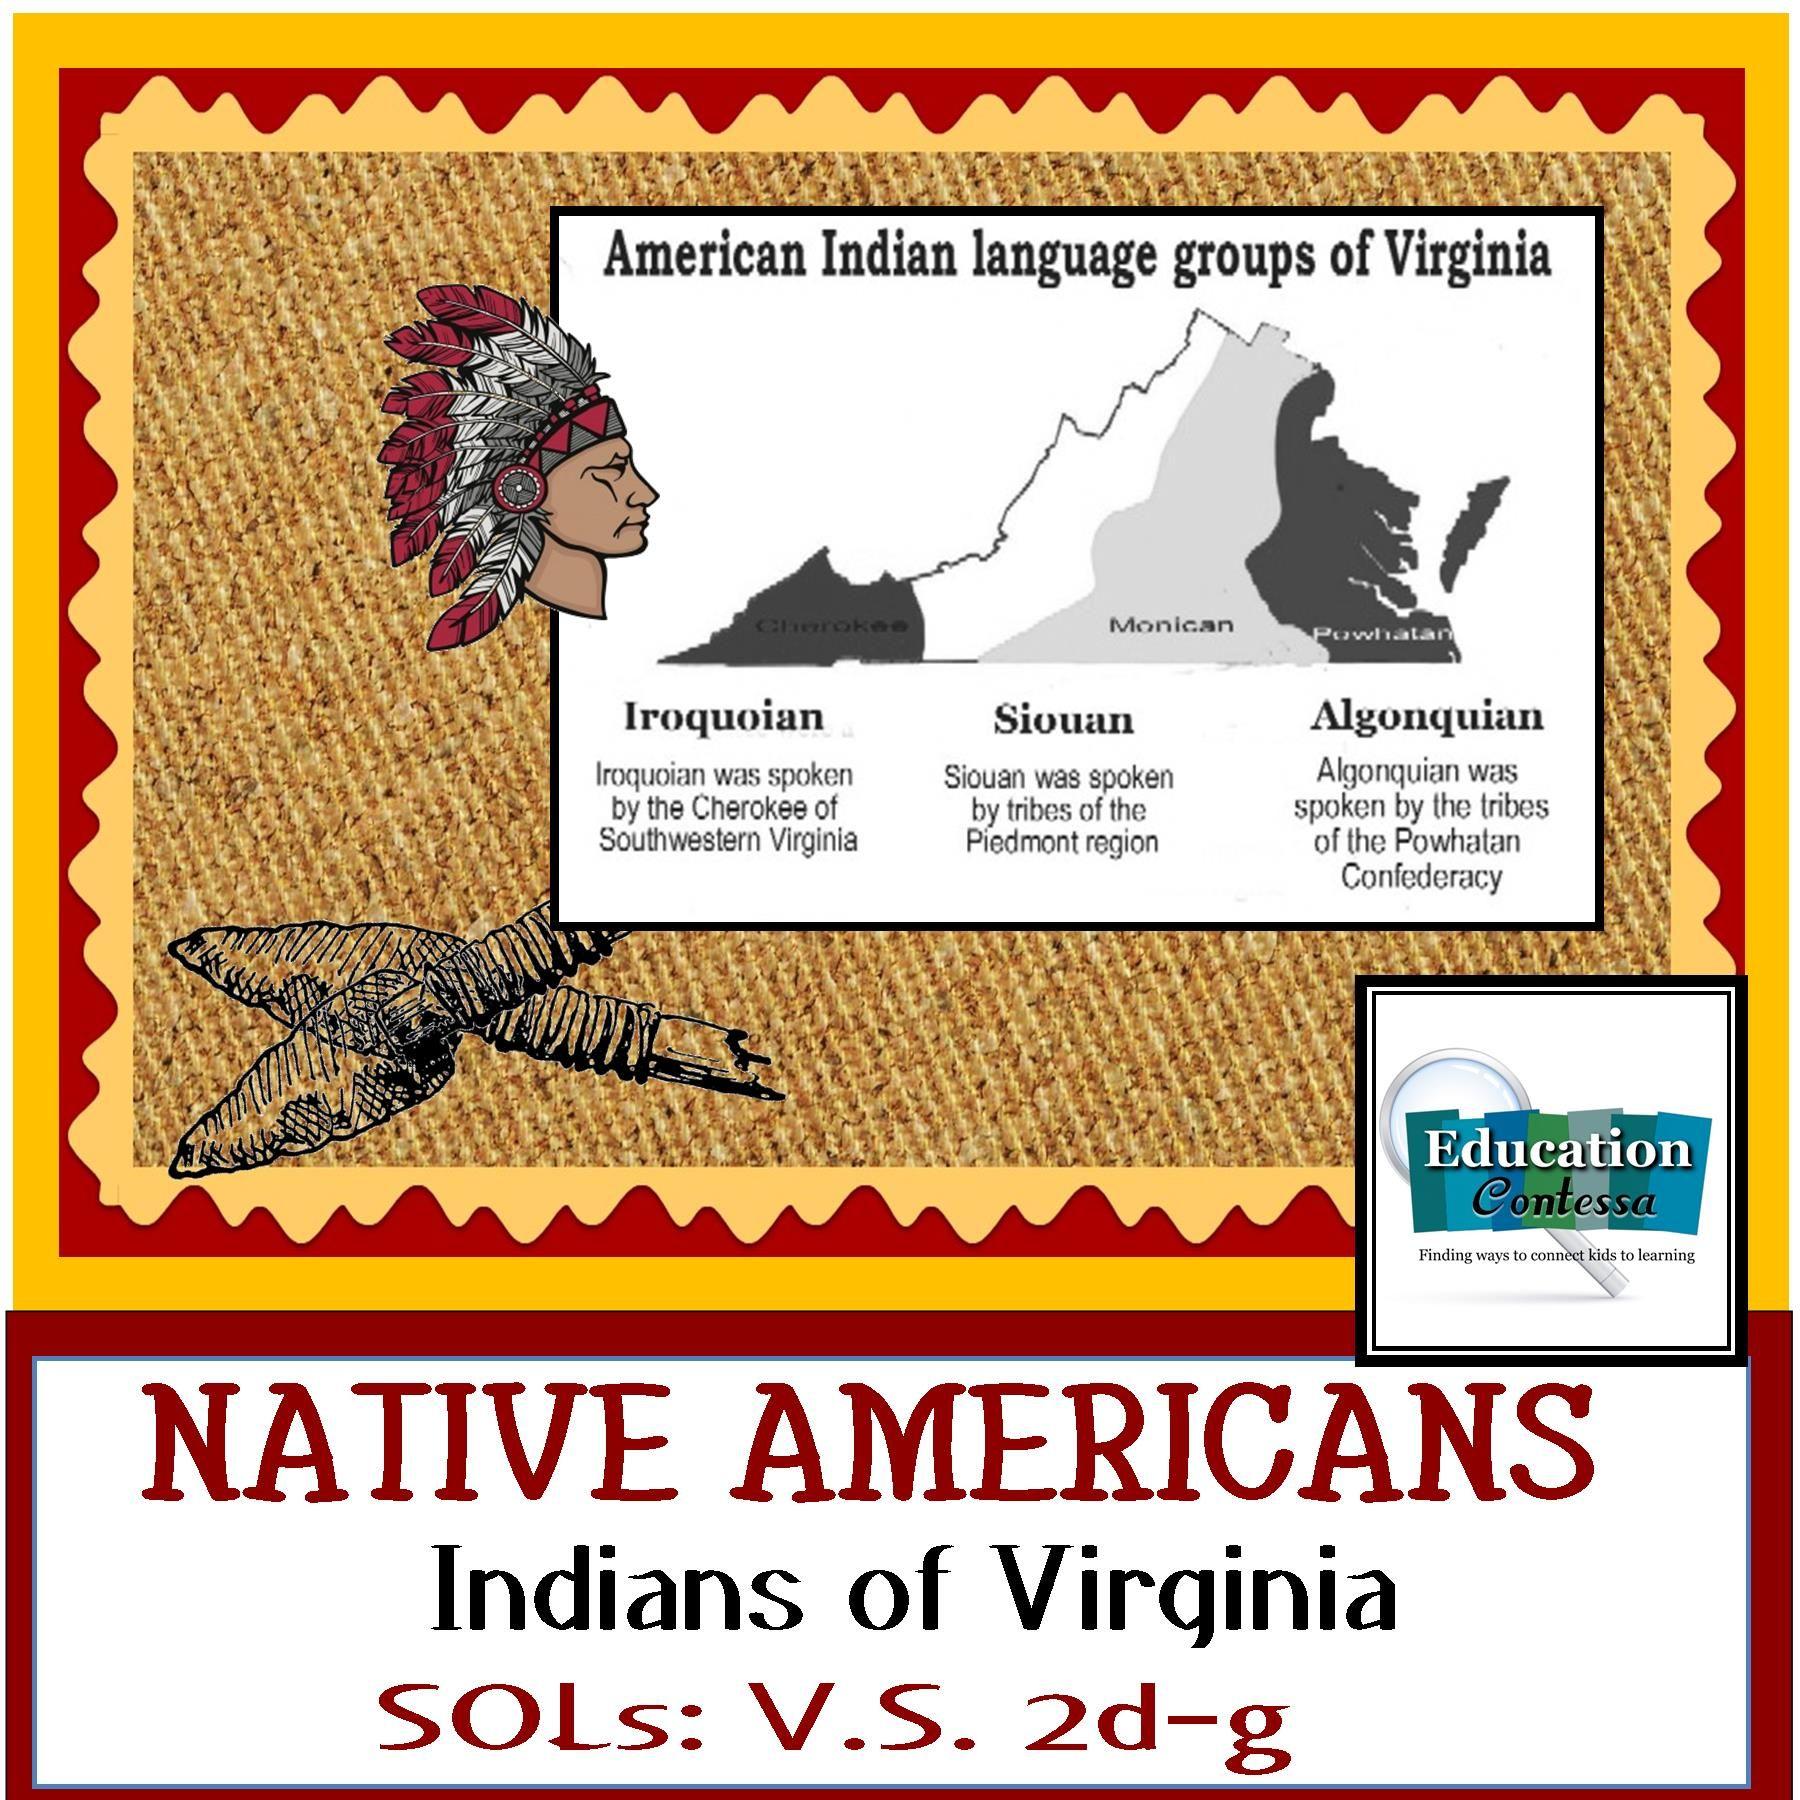 Va Native Plant Society: NATIVE AMERICAN INDIANS OF VIRGINIA